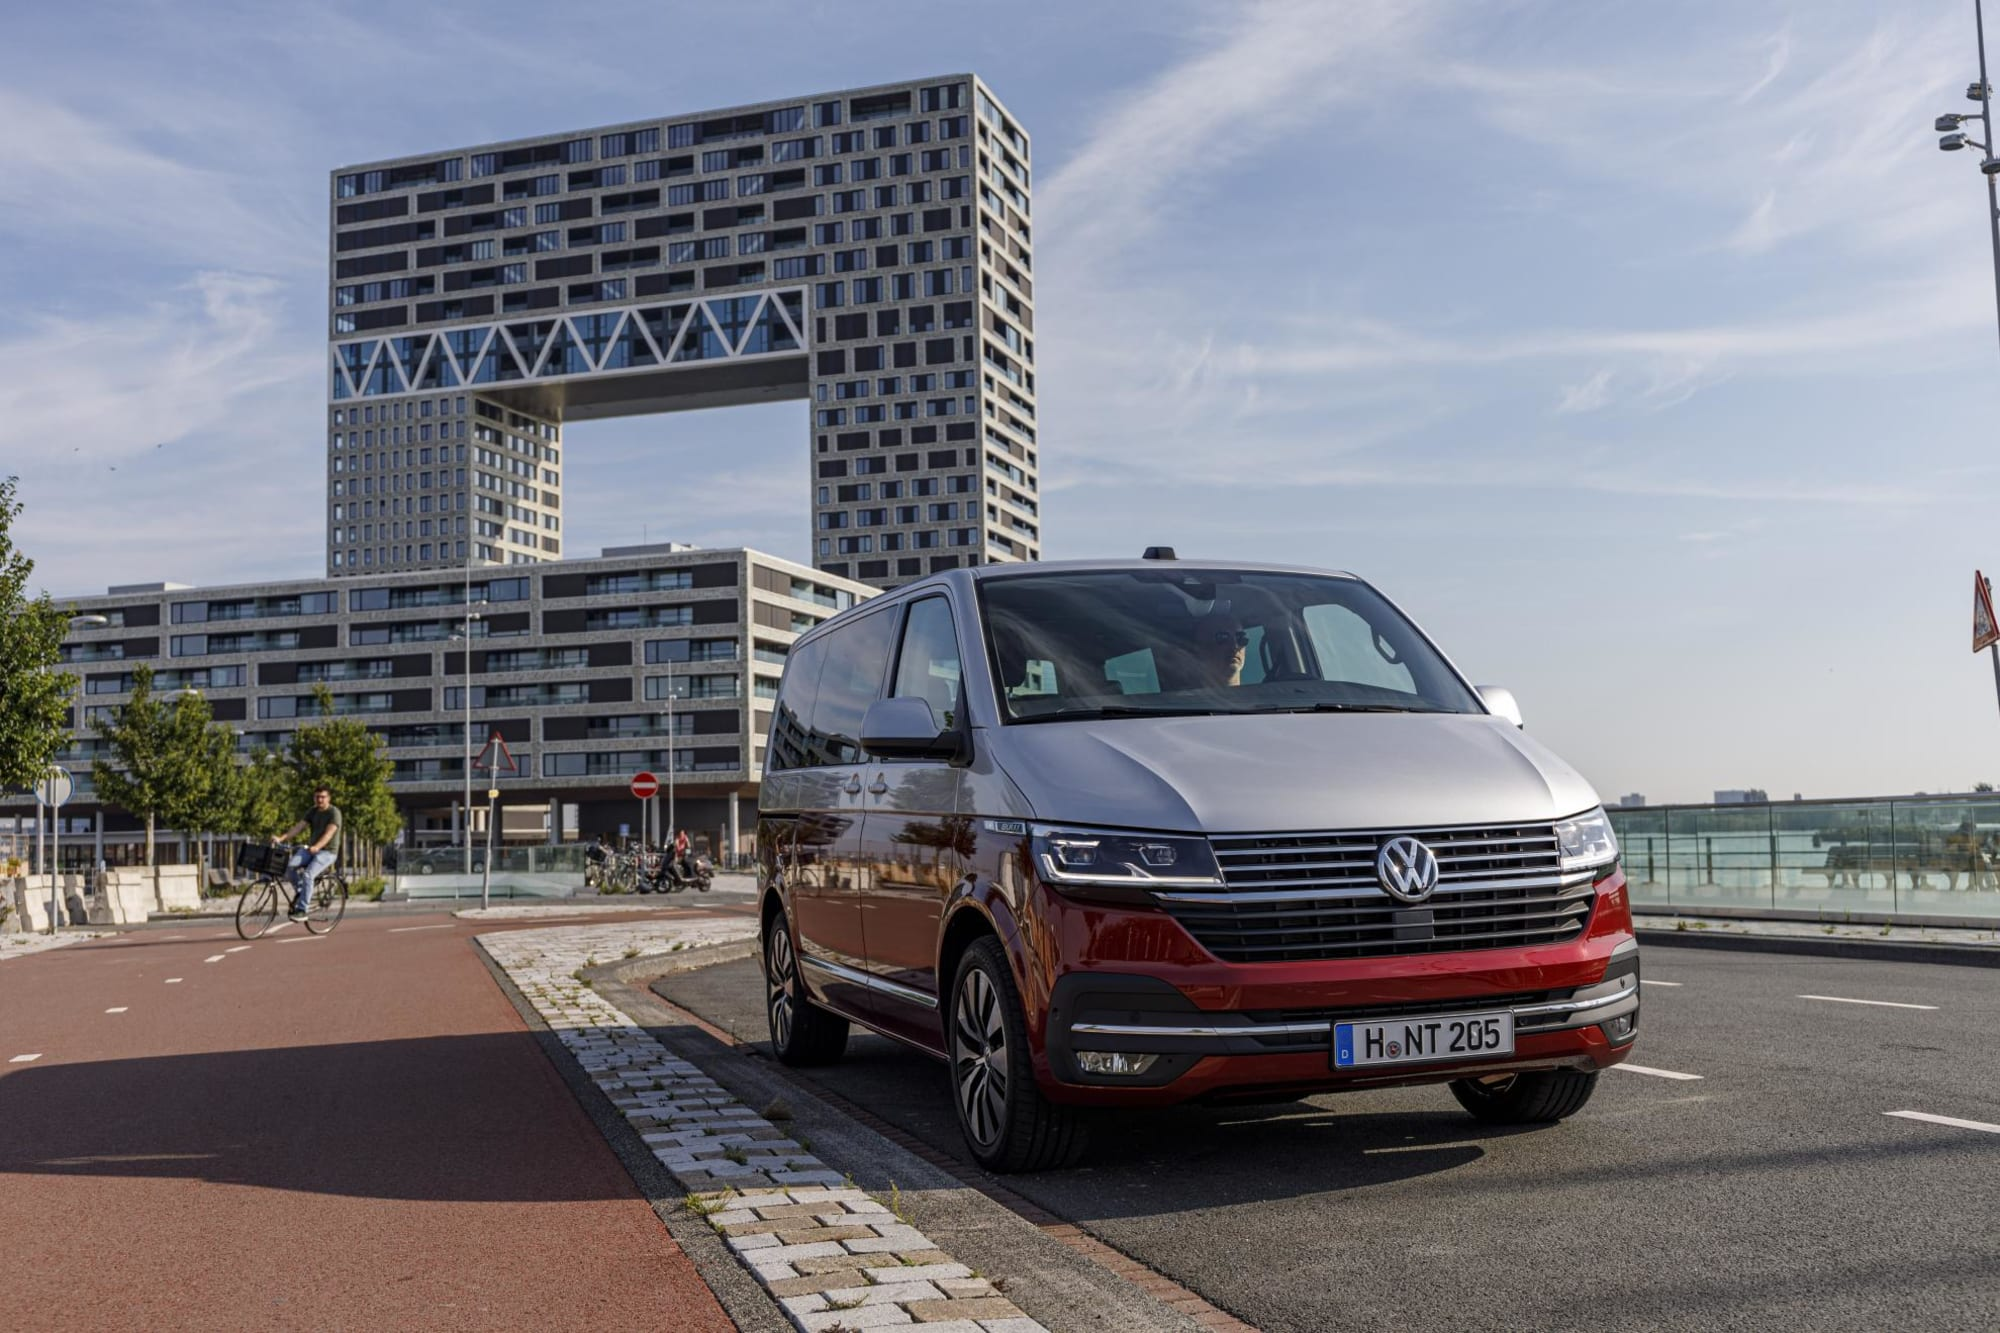 VW T6.1 Multivan Cruise-100